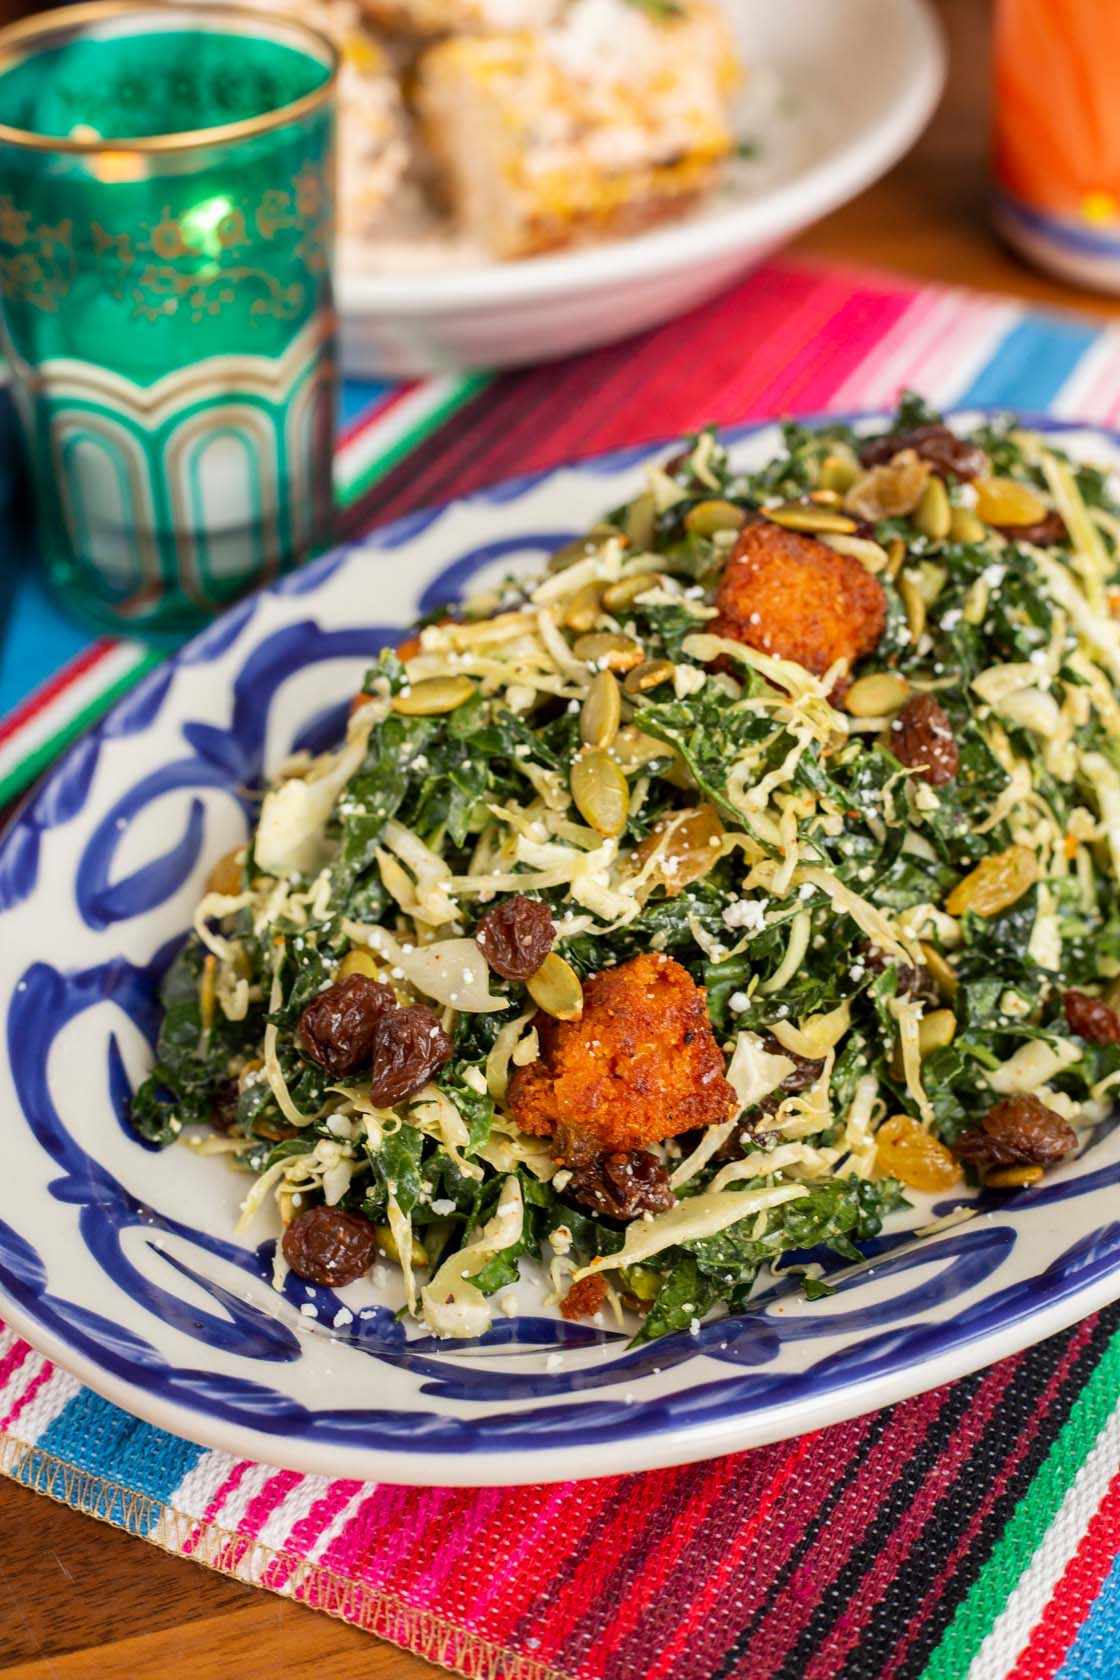 Kale salad on oval plate with cabbage, pepitas, cotija cheese, masa croutons, chimichurri yogurt dressing.